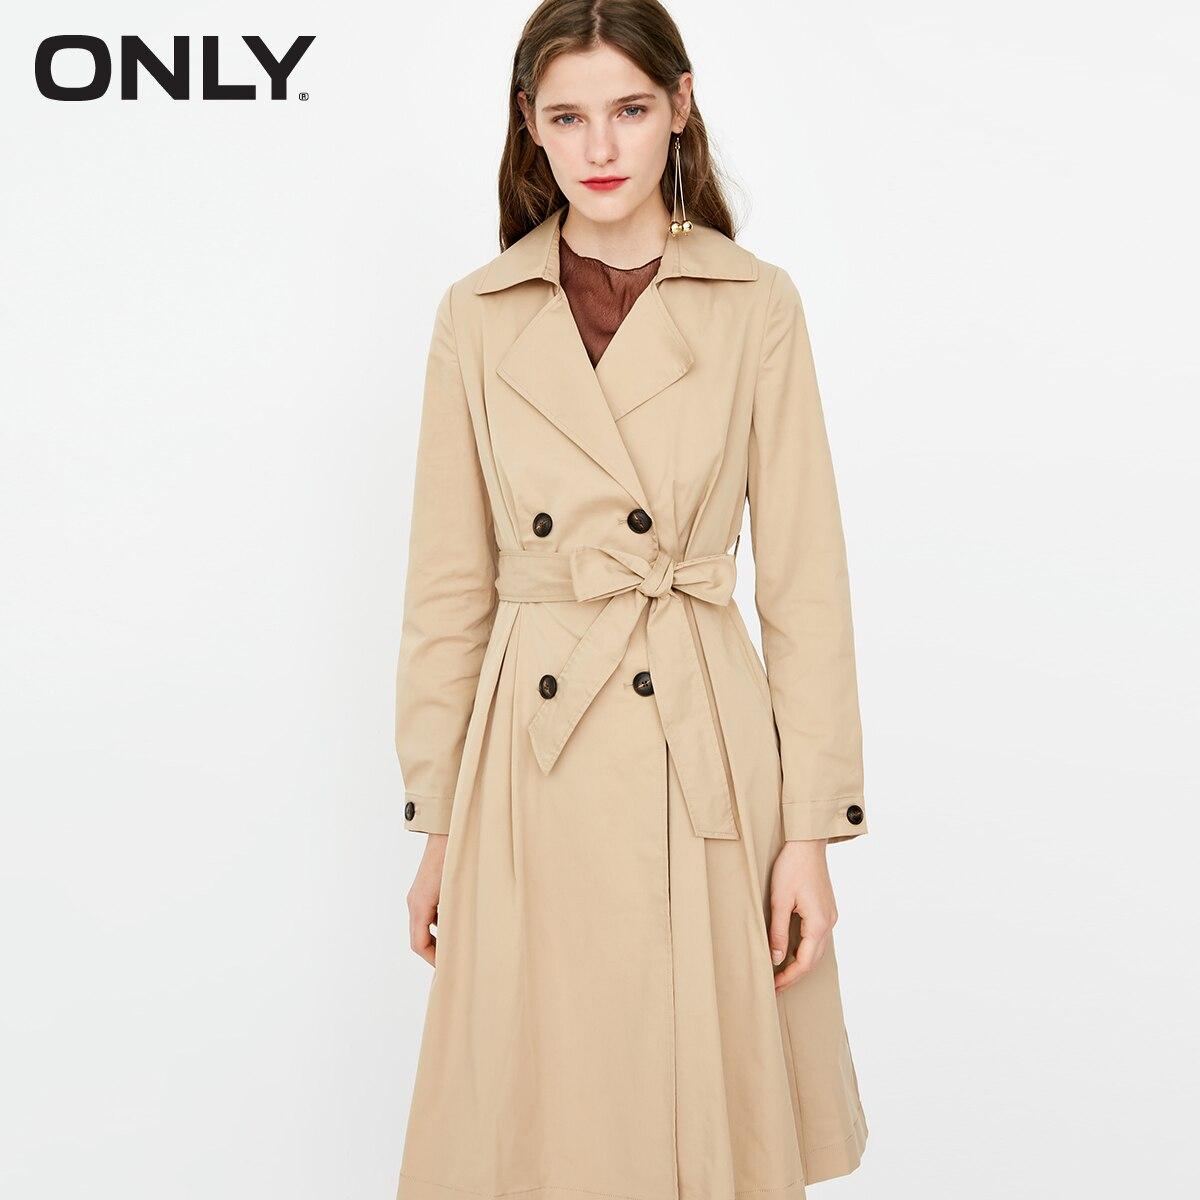 ONLY Autumn New Women's Lapel Khaki Medium Waist Length Wind Coat |118336551